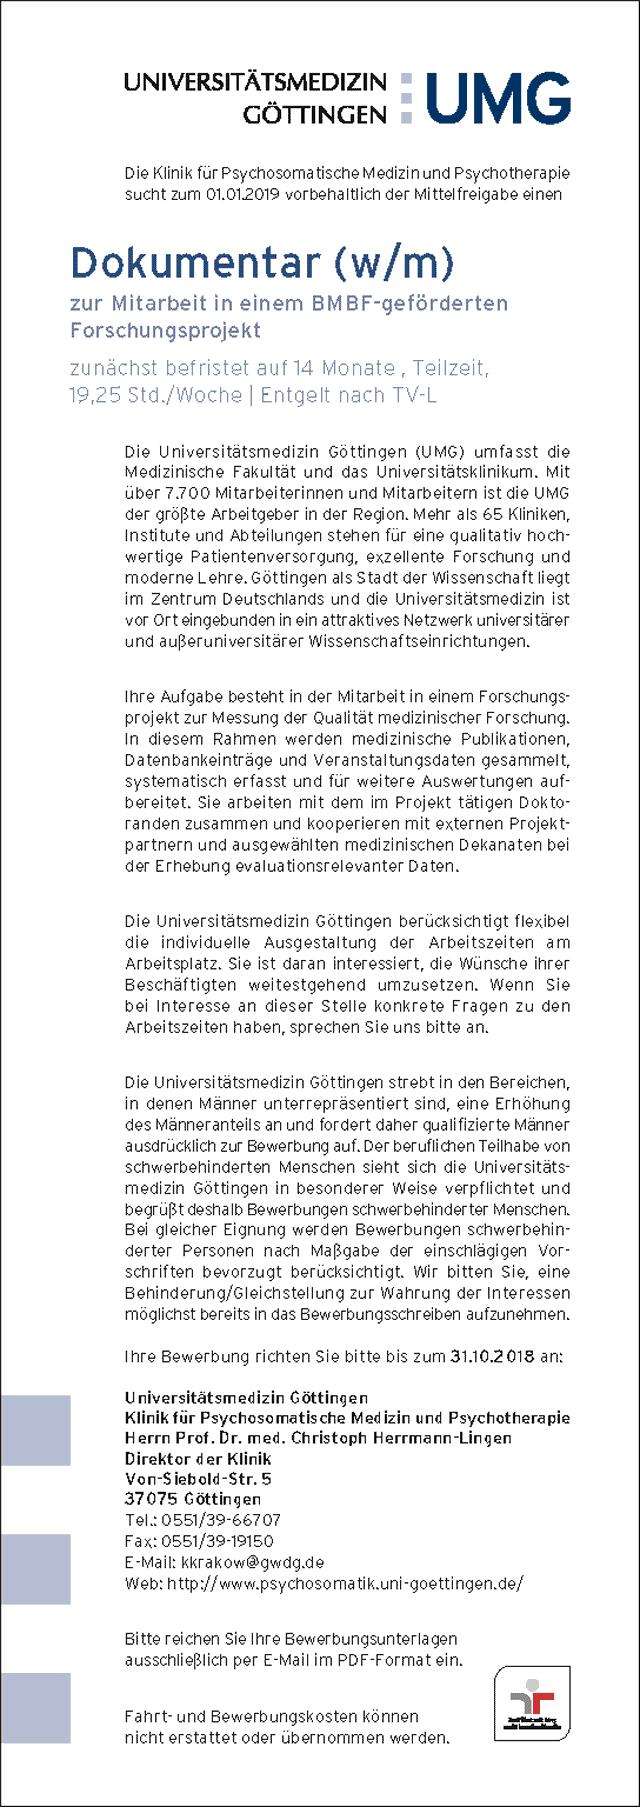 Universitätsmedizin Göttingen: Dokumentar (w/m)